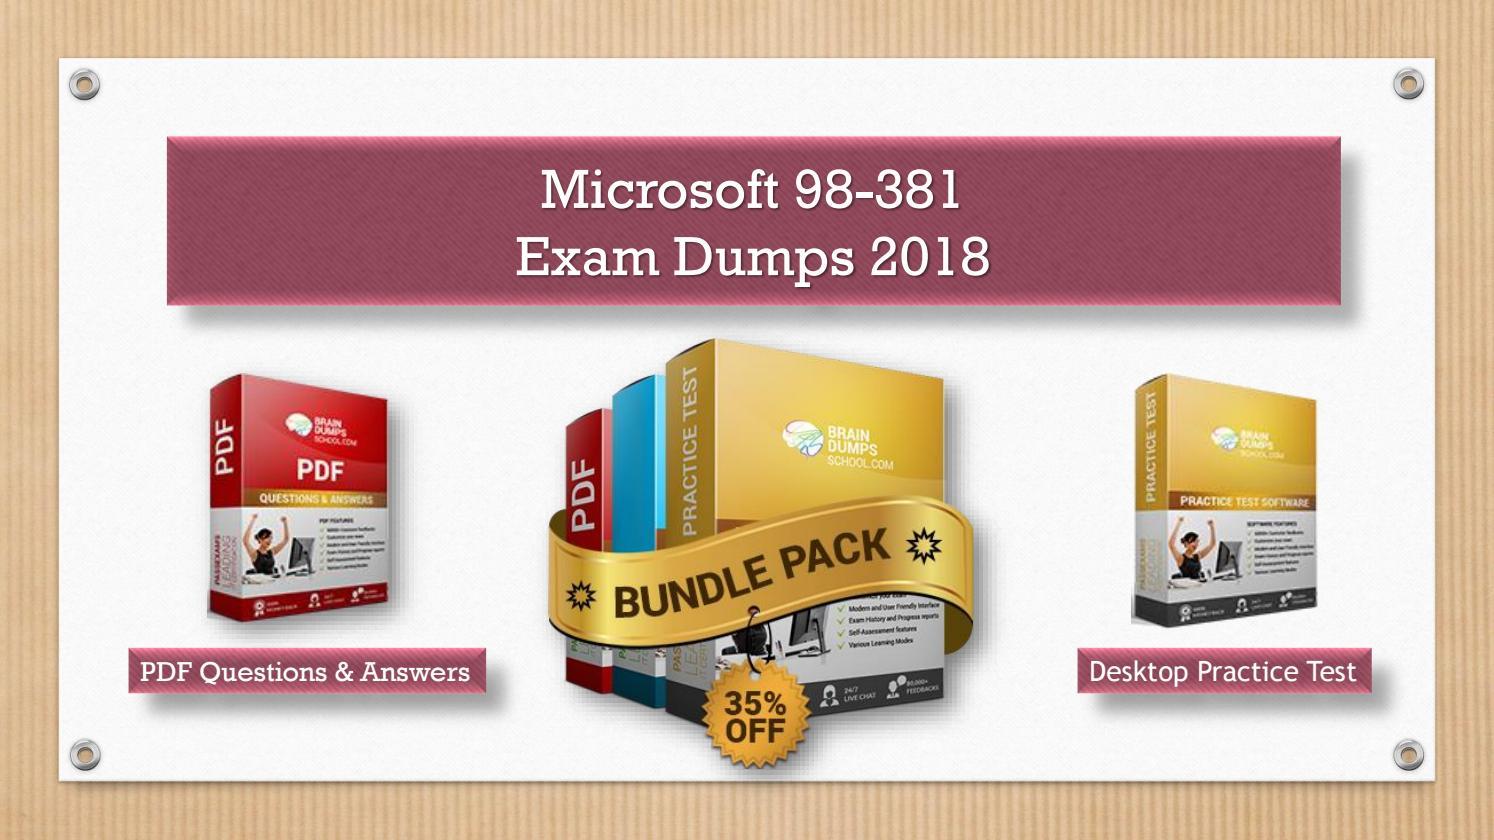 Secrets of Python (version 3 6 or later) 98-381 Exam Dumps